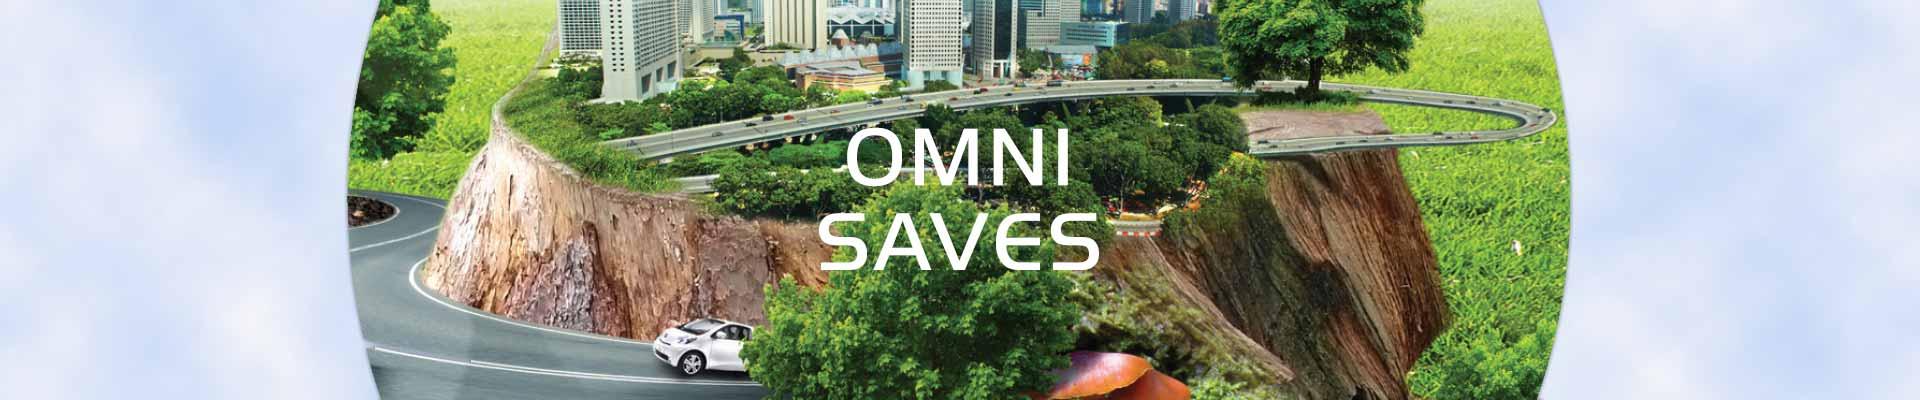 Omni Home Green Planet